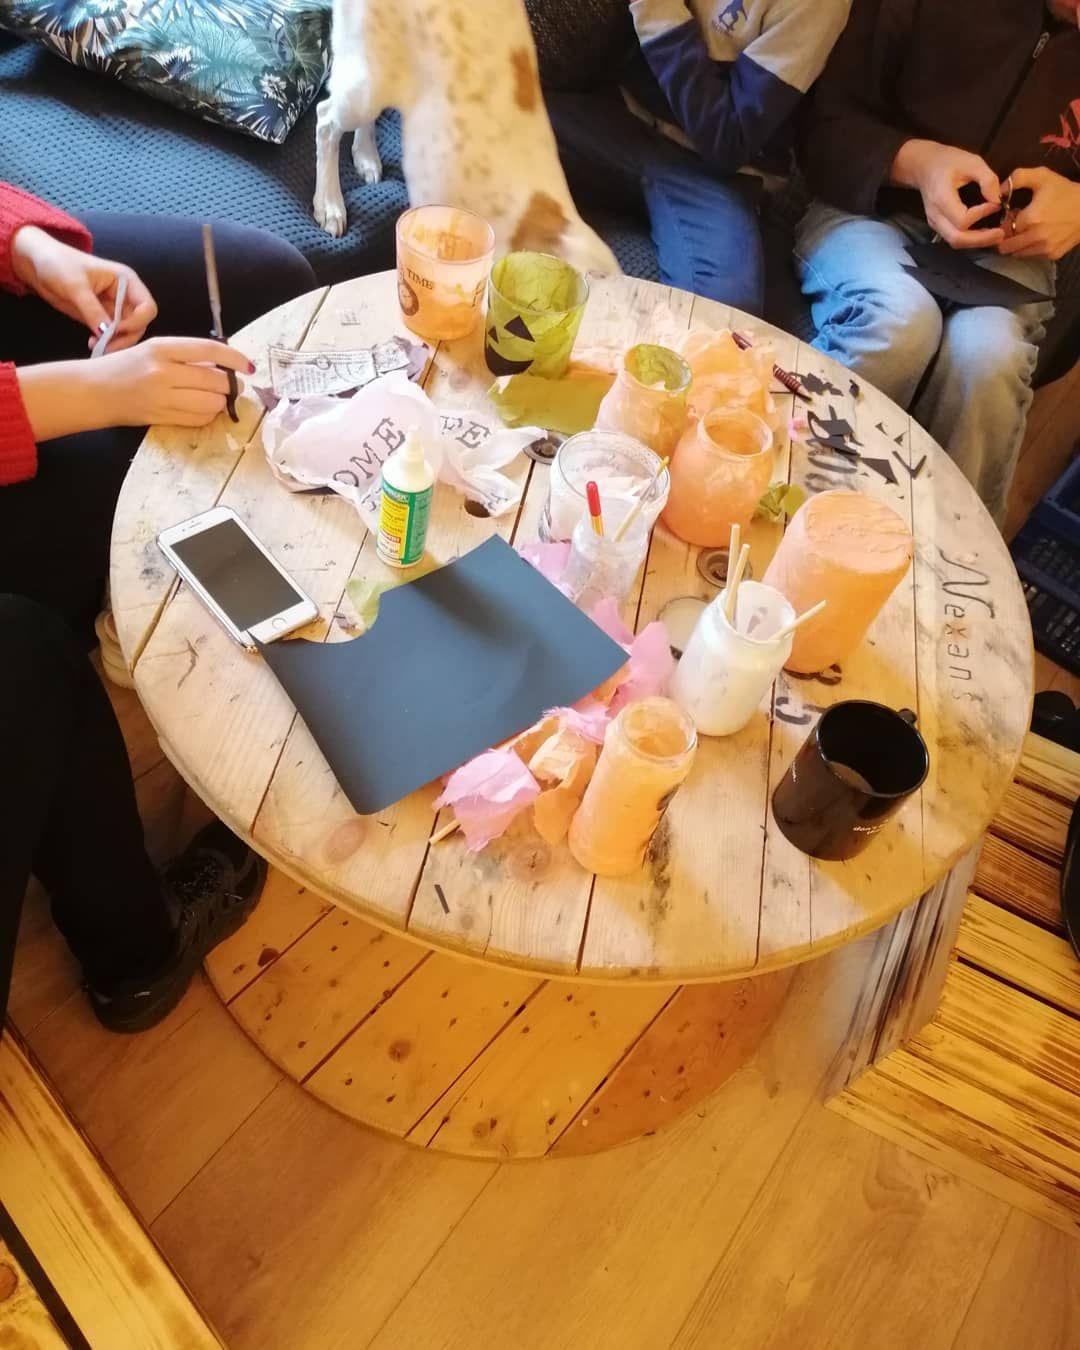 Es wieder so schön 😍😊 www.donnaquijote.com #upcycling #upcyclingdesign #upcyclinglife #kerzen #windlicht #gläser #glas #halloween #gespenster #oktober #diy #doityourself #chemnitz #handmade #handgemacht #unikat #einzelstück #kids #kreativ #kreativmitkids